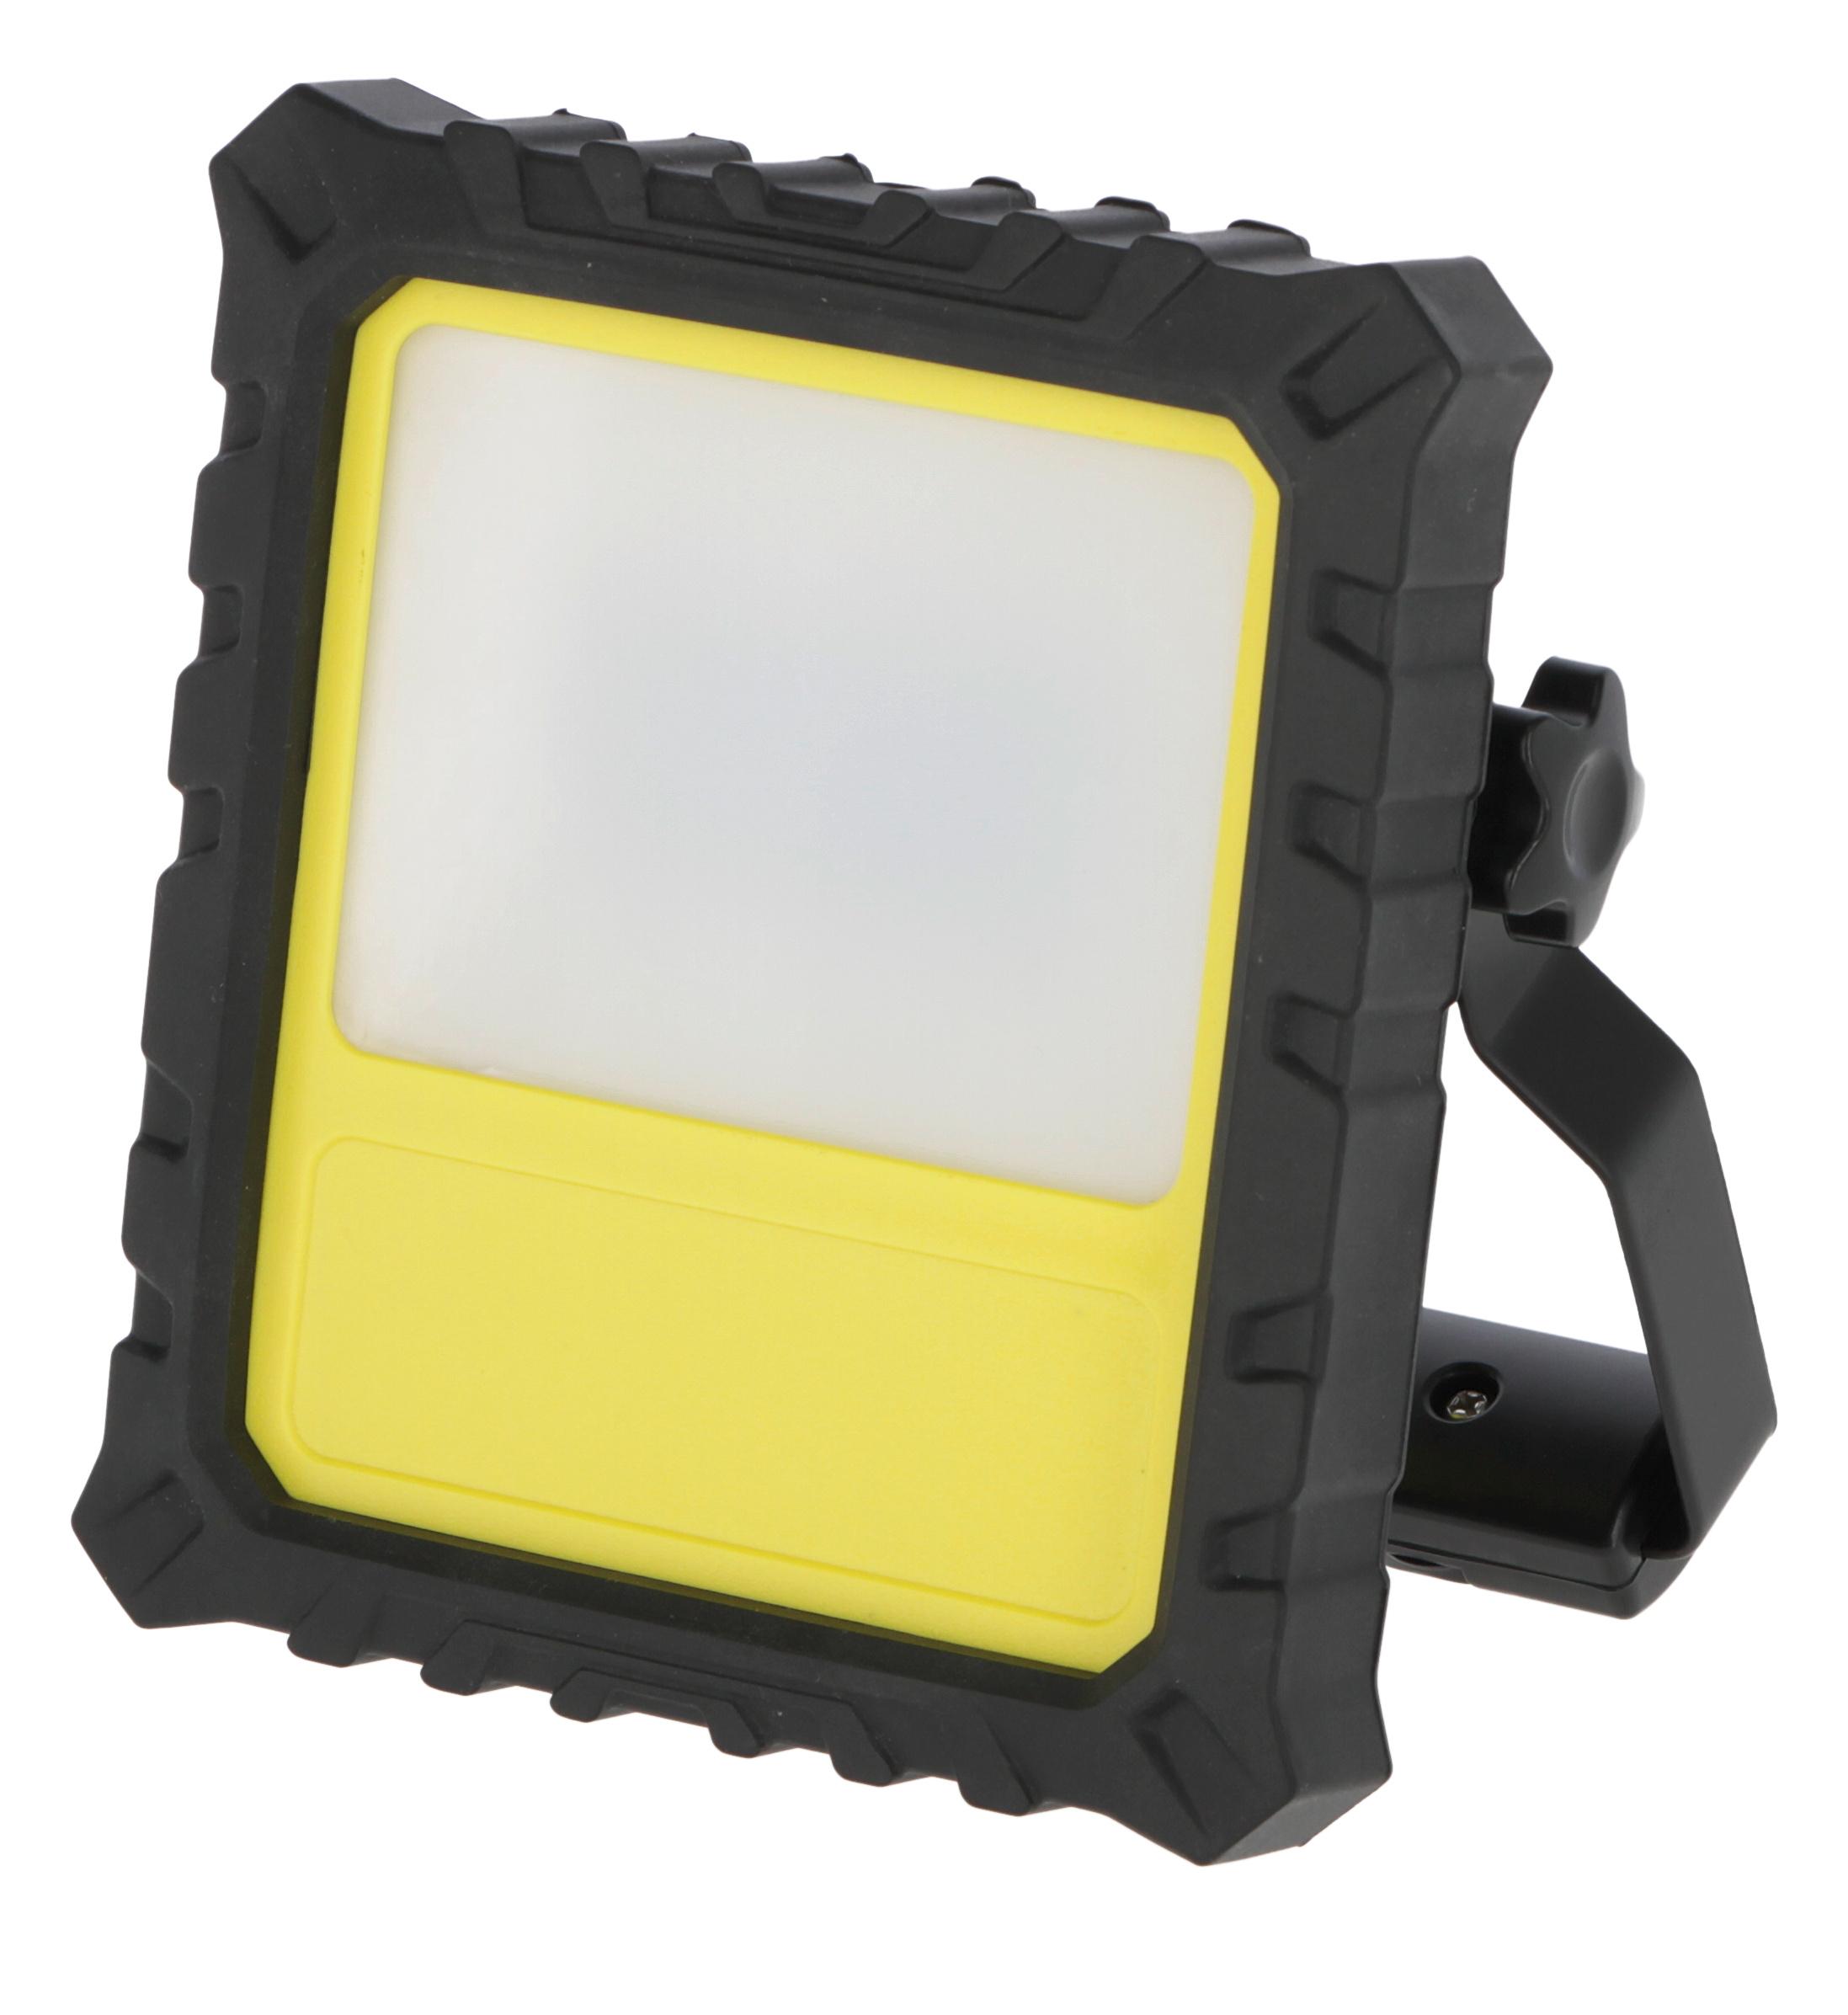 Mobiler LED-Akku-Strahler WorkFire Pro, 20W